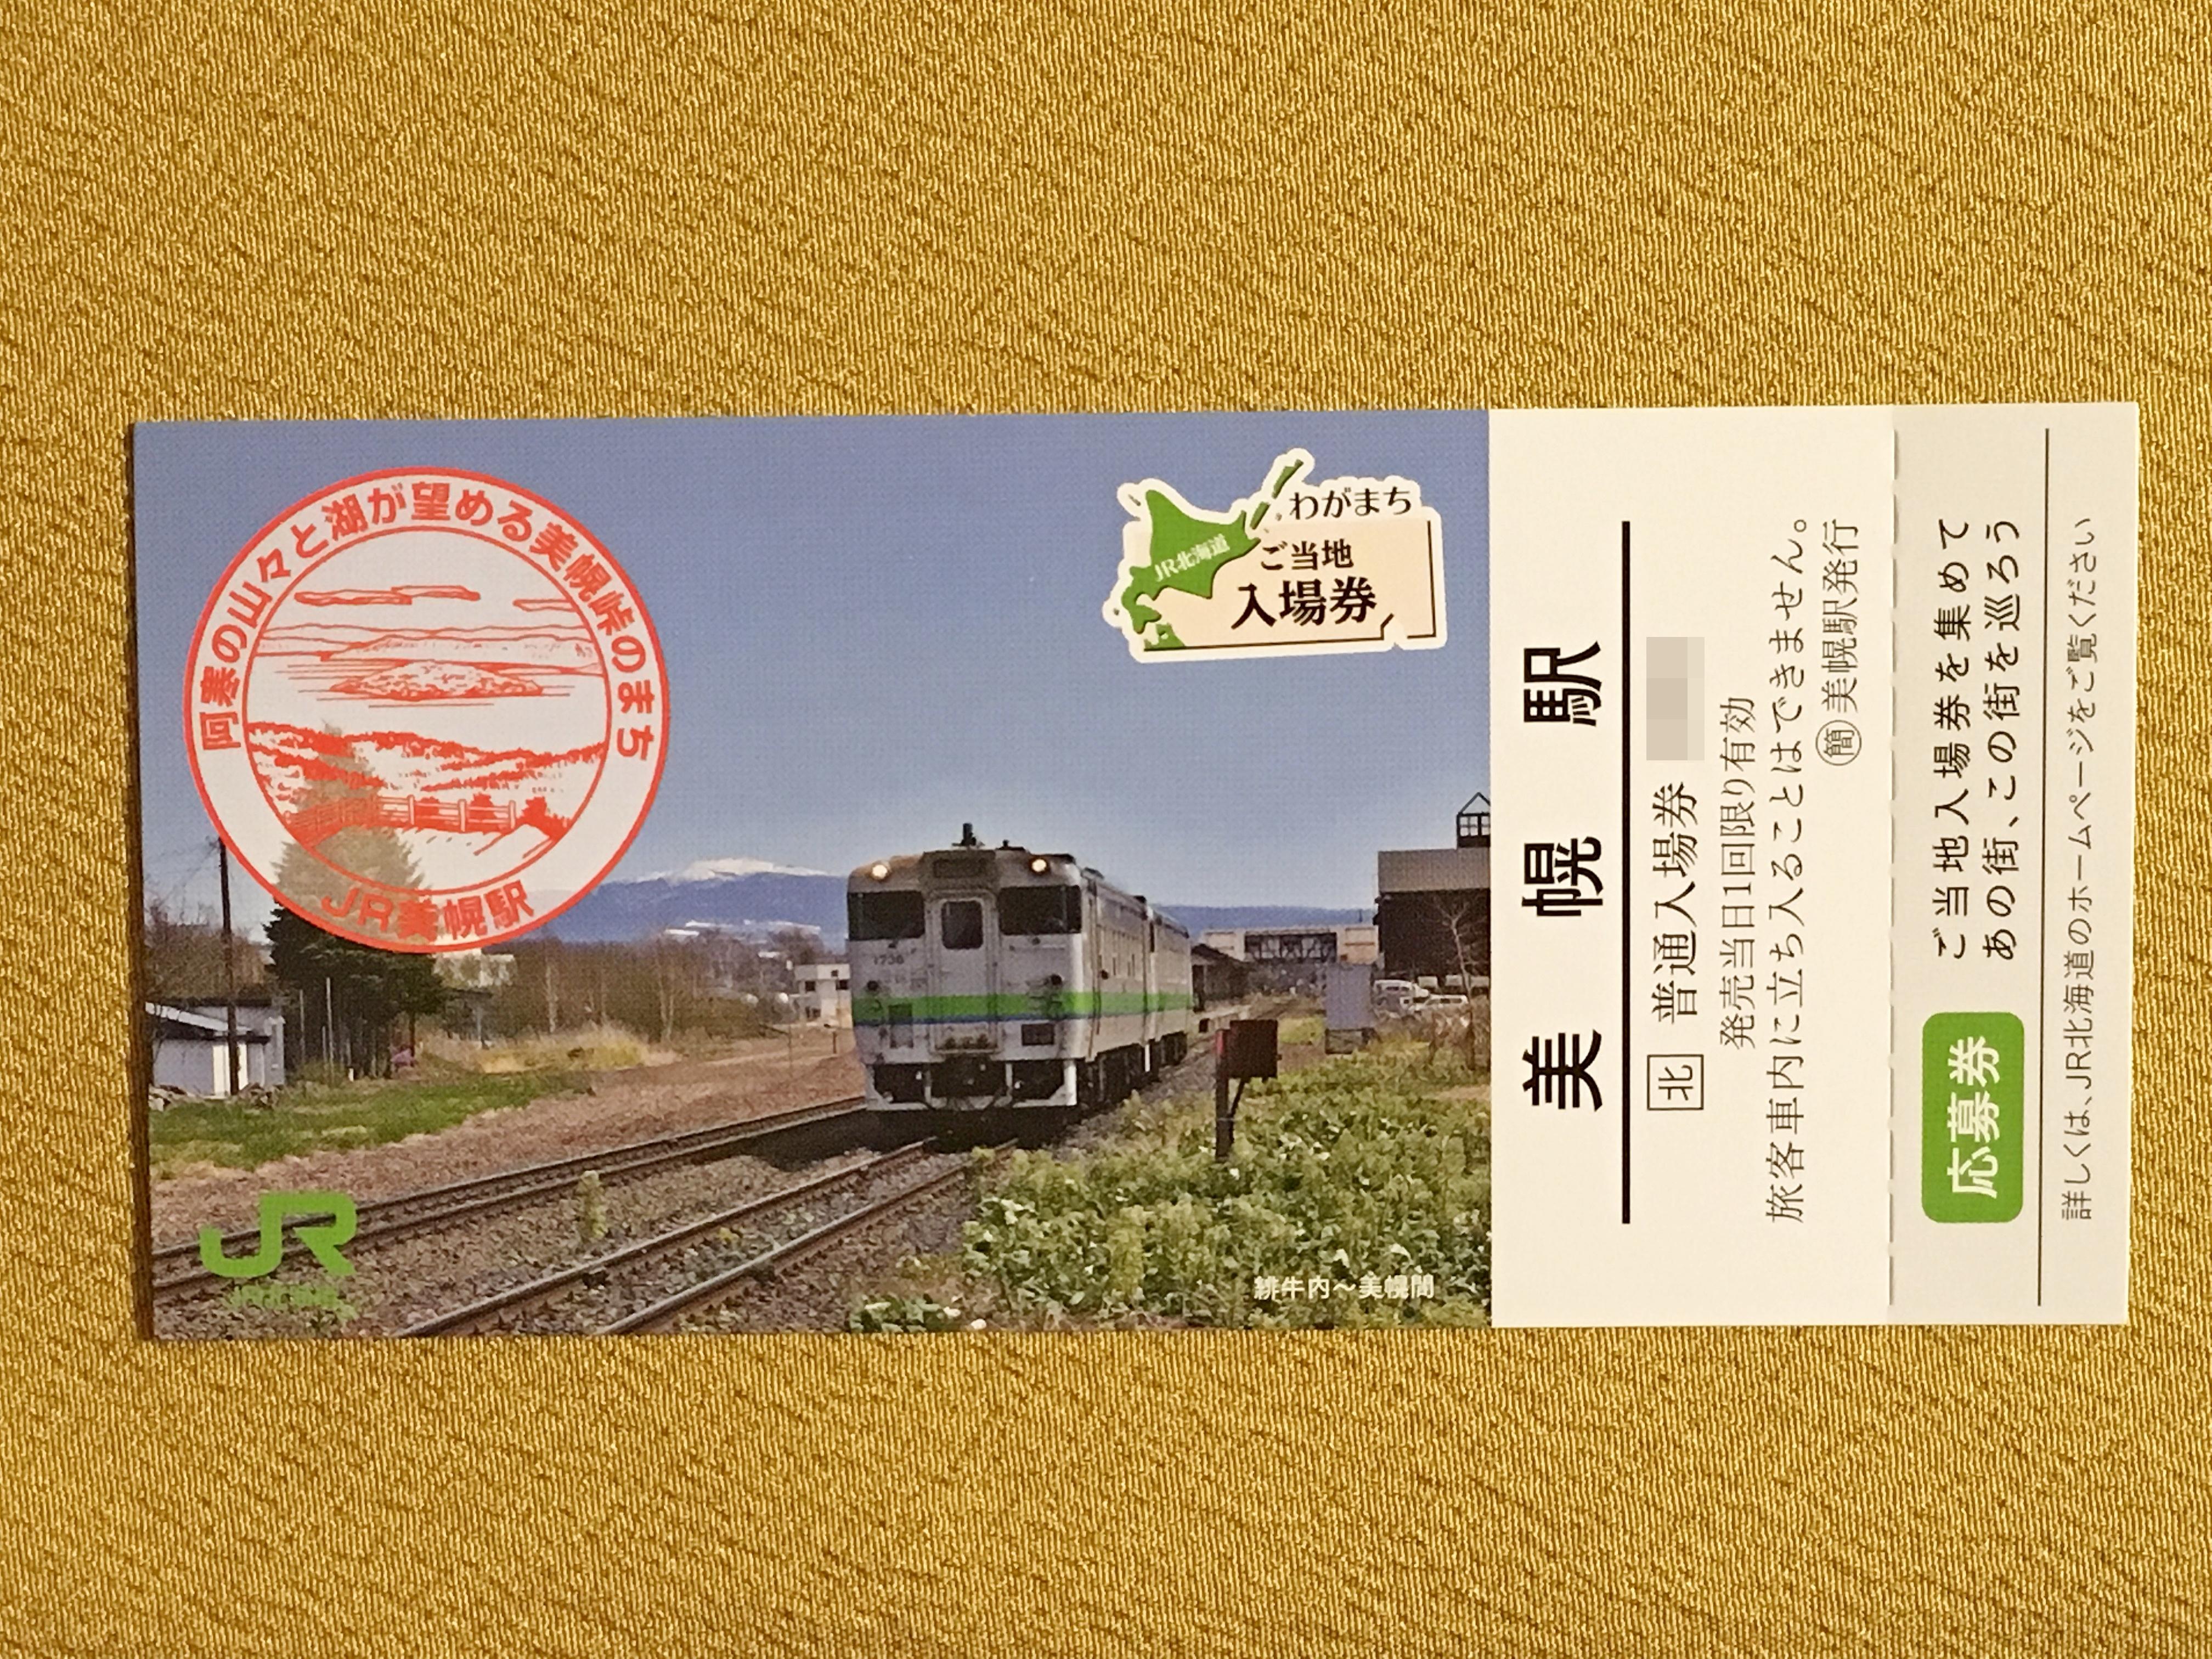 JR北海道ご当地入場券  美幌駅表.JPG